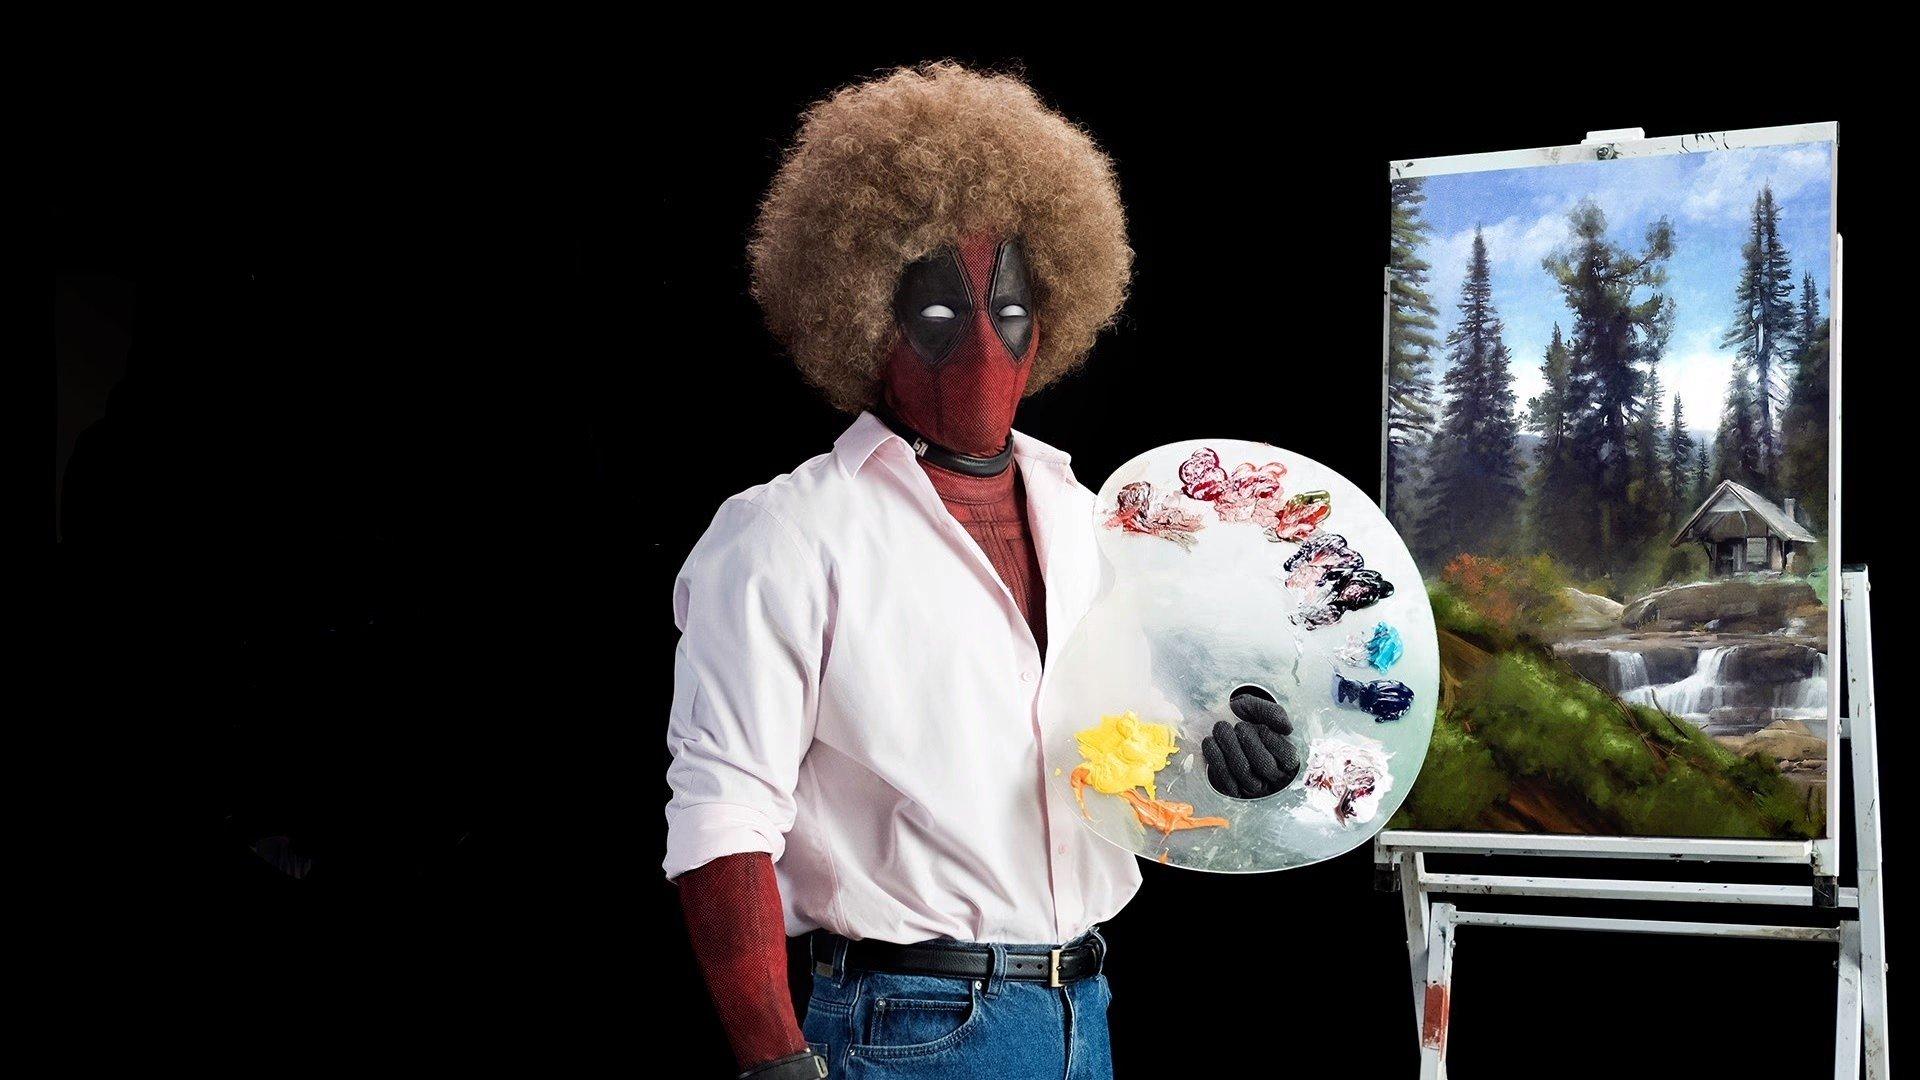 电影 - Deadpool 2  Bob Ross 死侍 绘画 Ryan Reynolds 壁纸